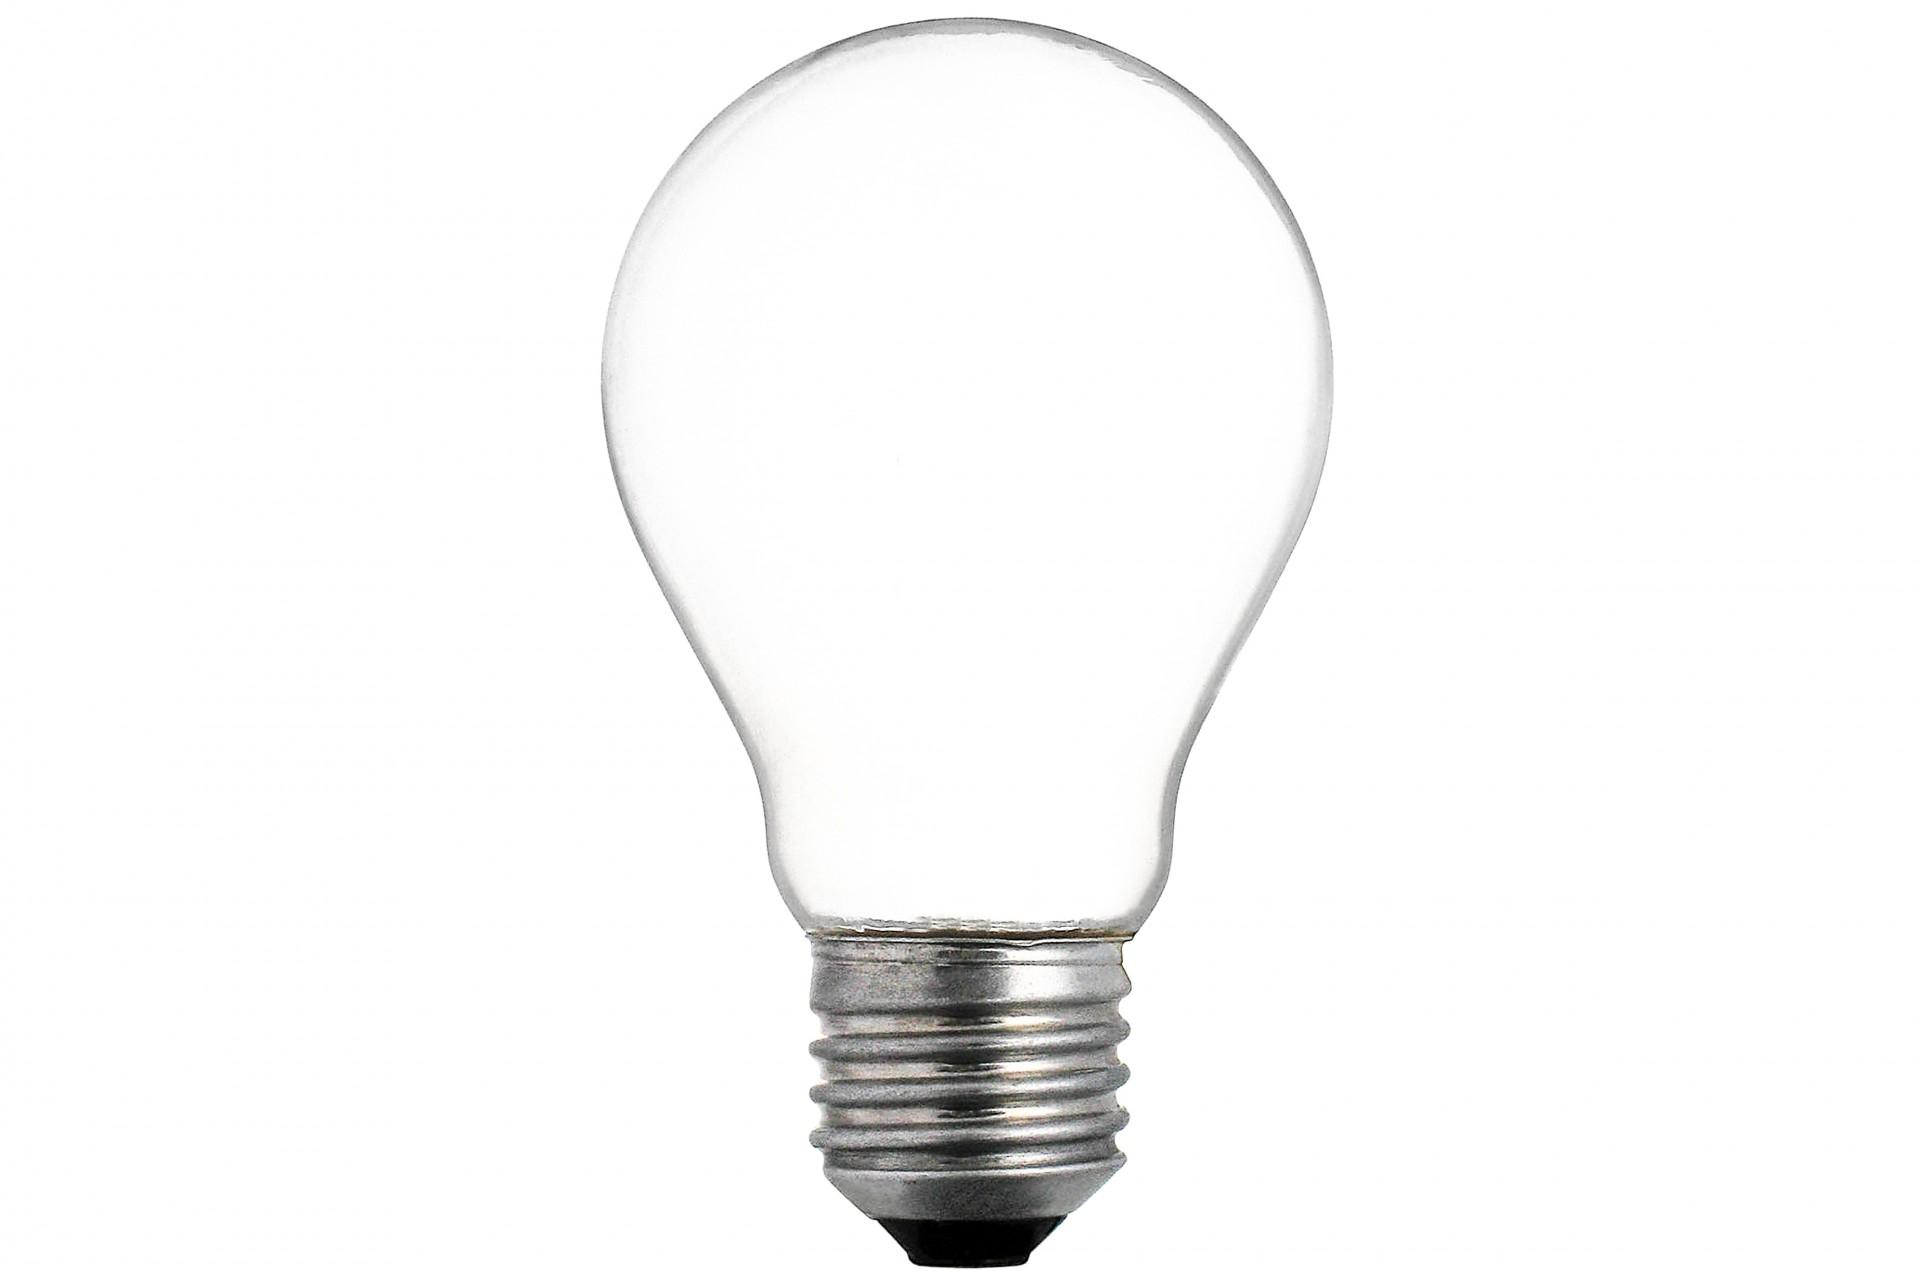 Empty Electric Light Bulb Free Stock Photo